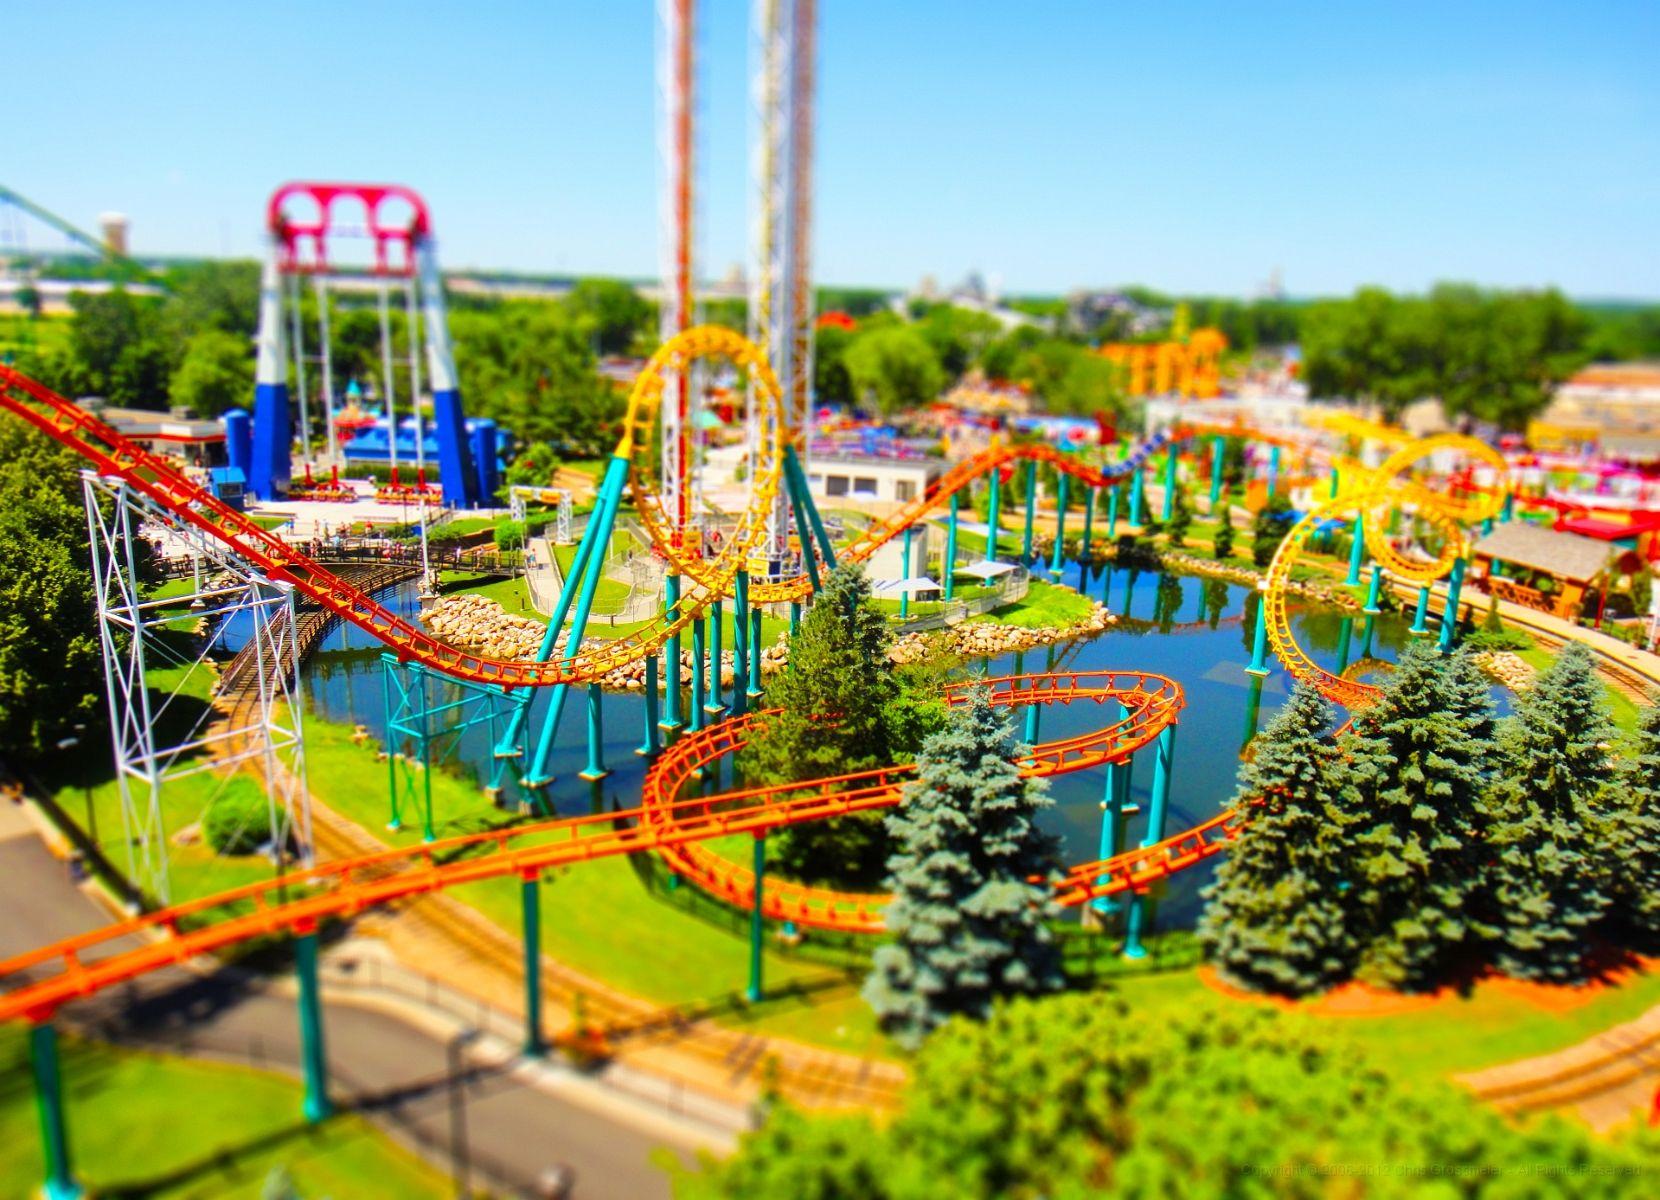 Valleyfair Amusement Park